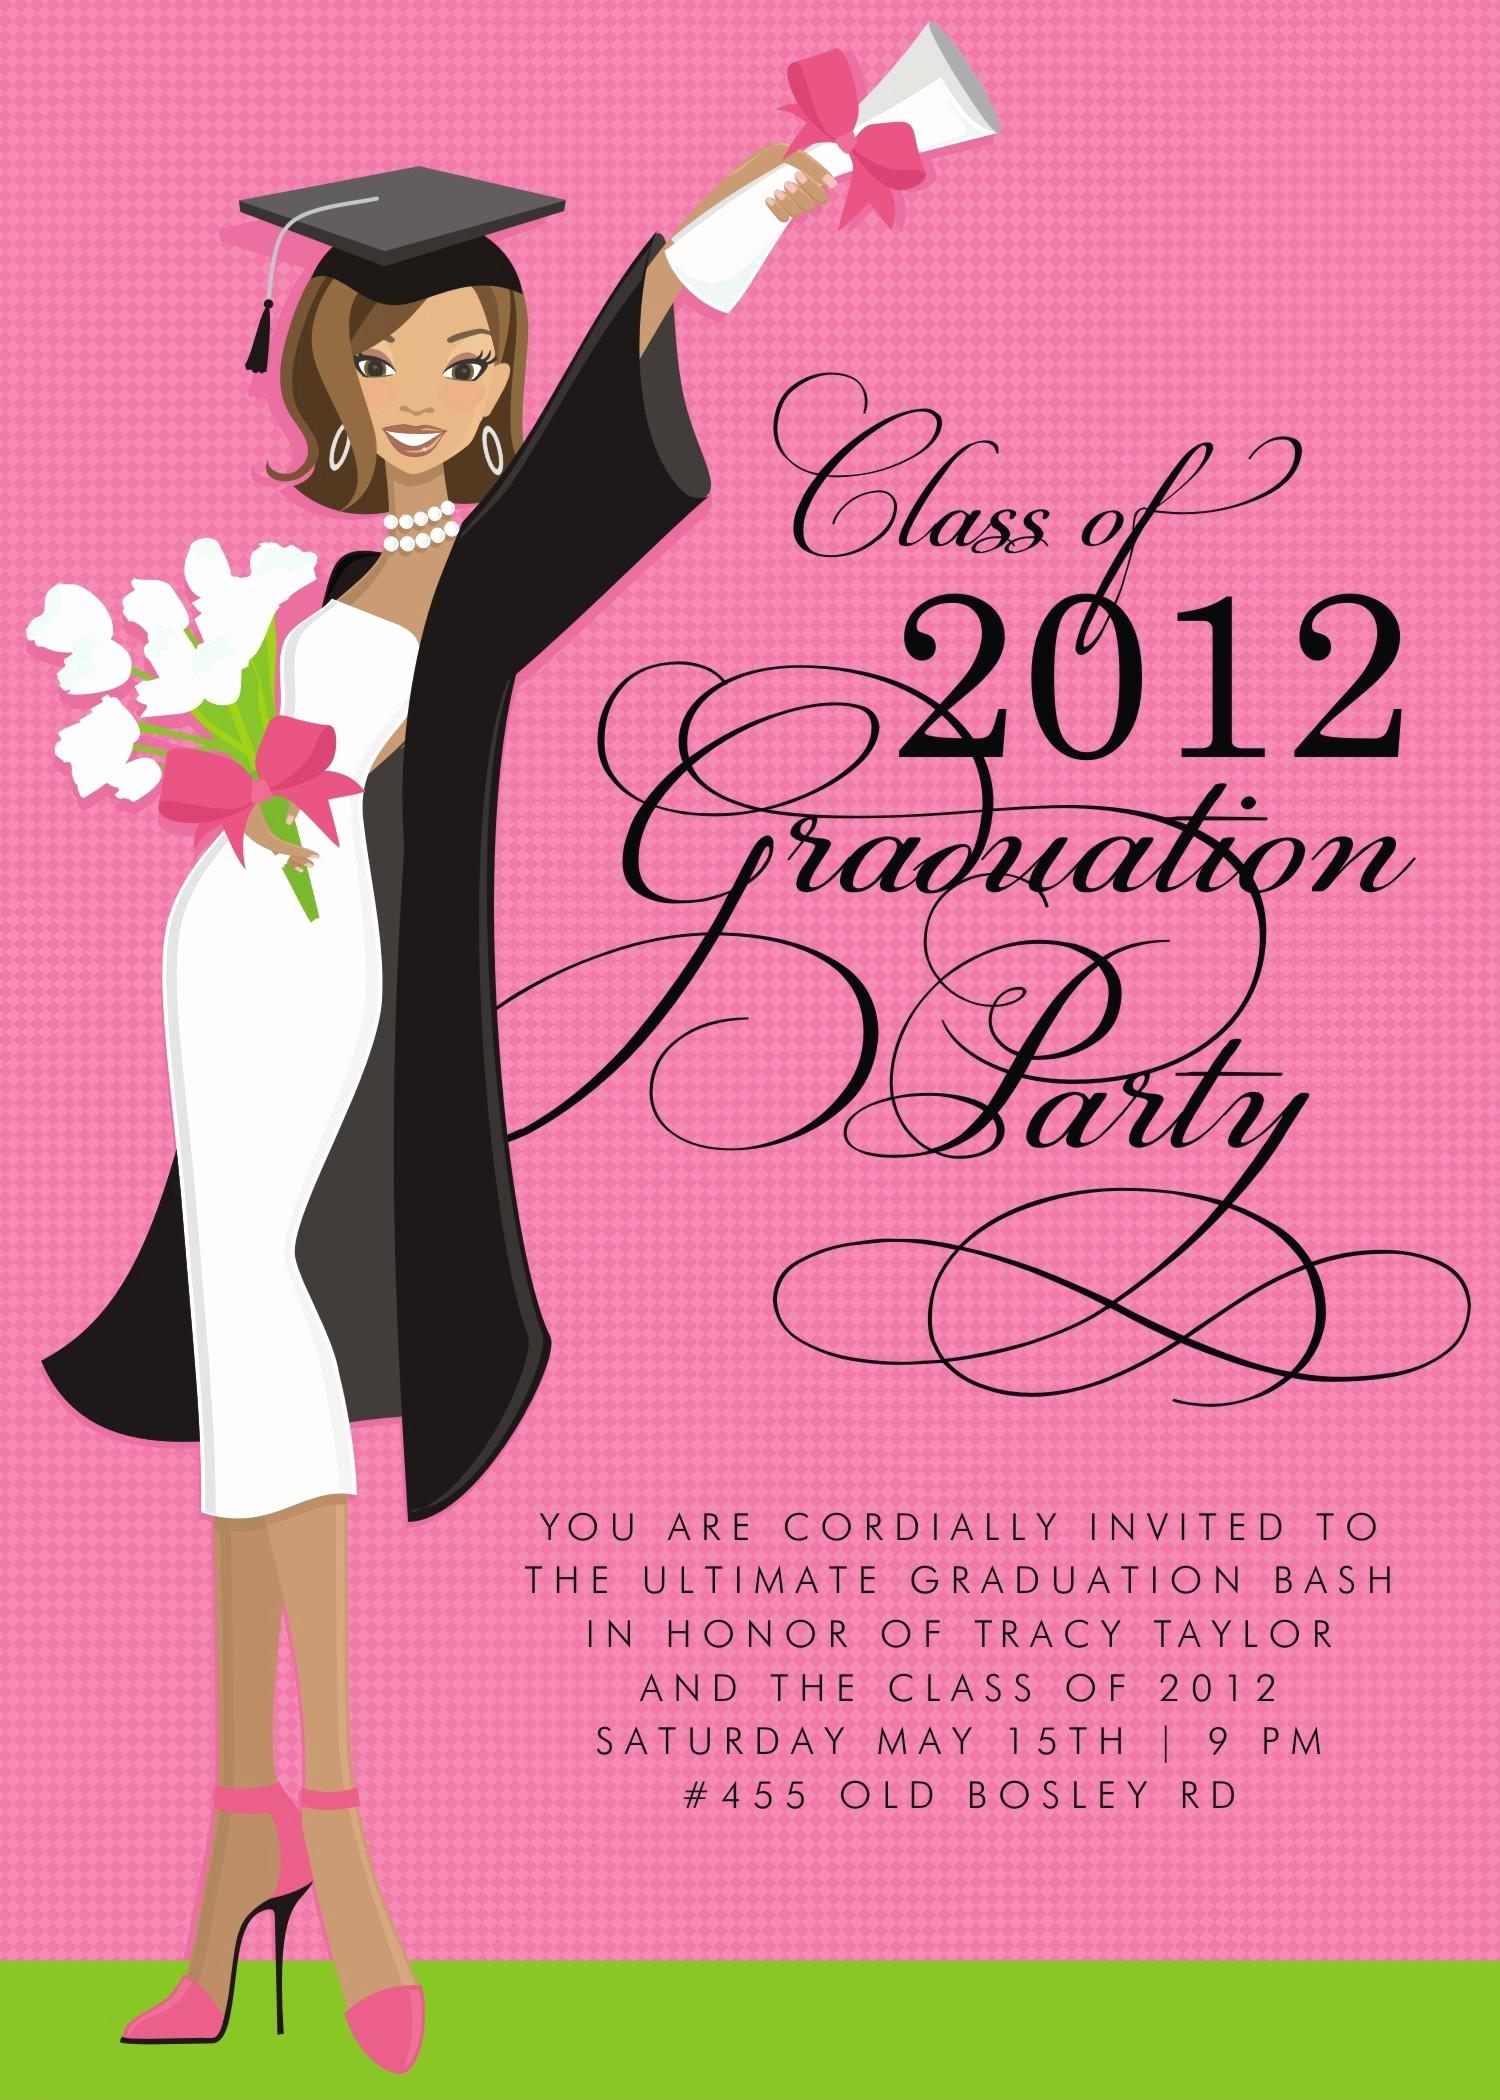 Graduation Ceremony Invitation Card Luxury Graduation Invitations Graduation Invitations Wording